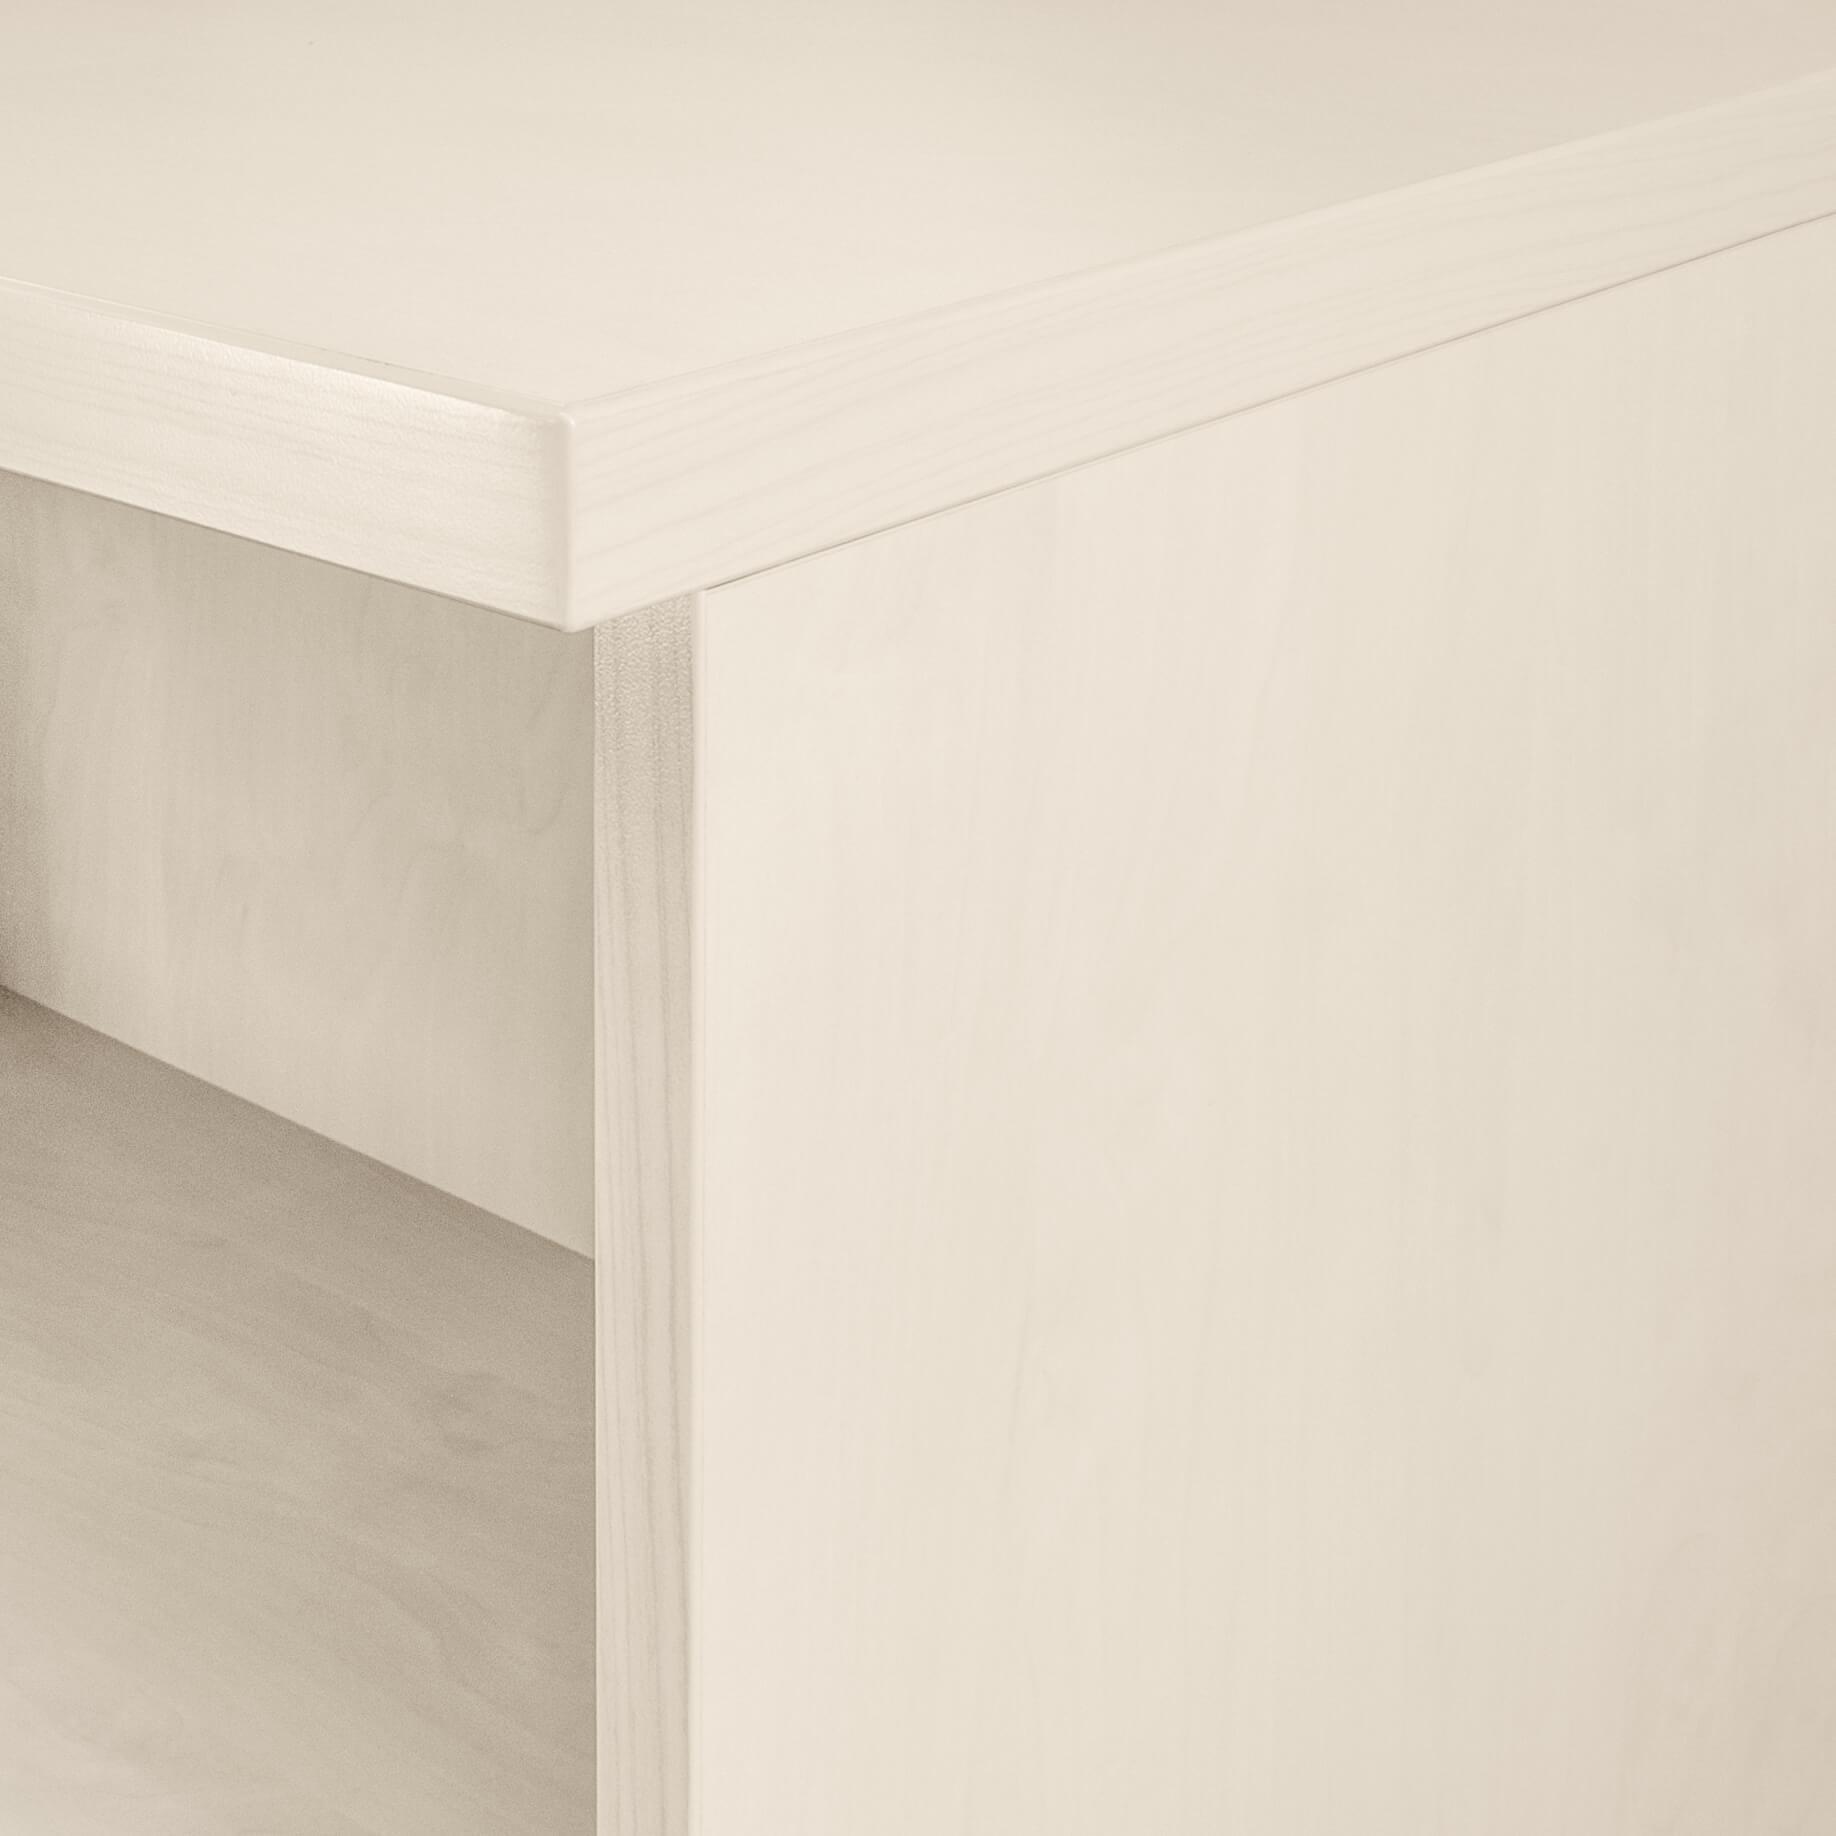 PROFI Aktenschrank abschließbar 5OH Weiß-Ahorn Schrank Büroschrank Schiebetürenschrank